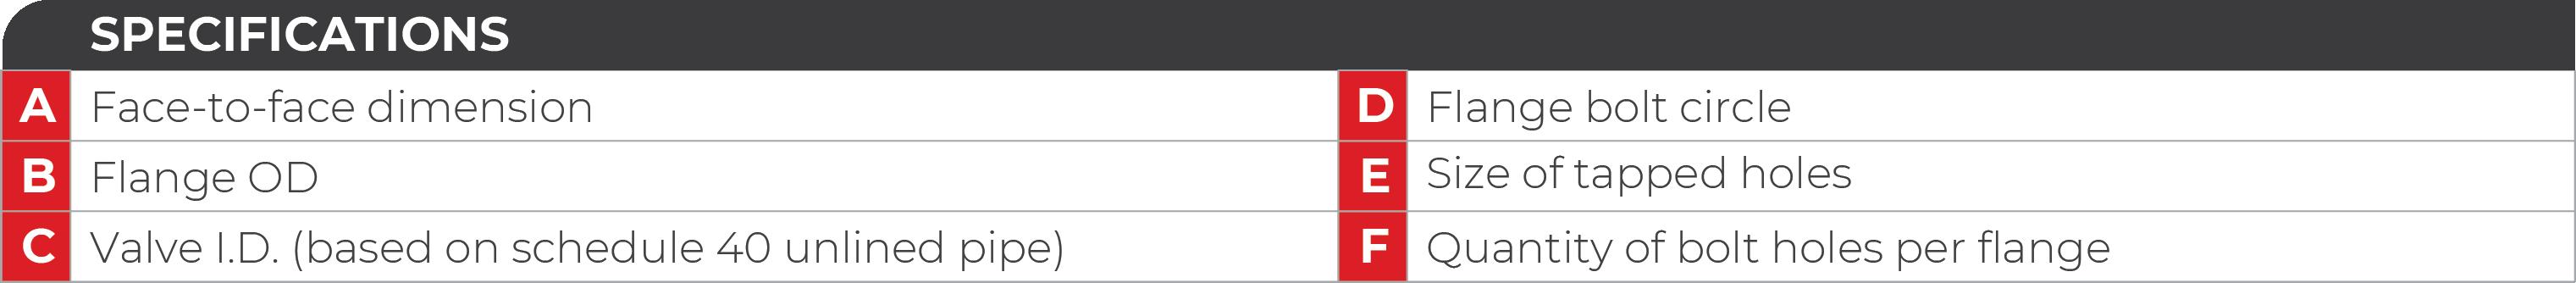 SlurryFlo Control Valve specification dimensions.